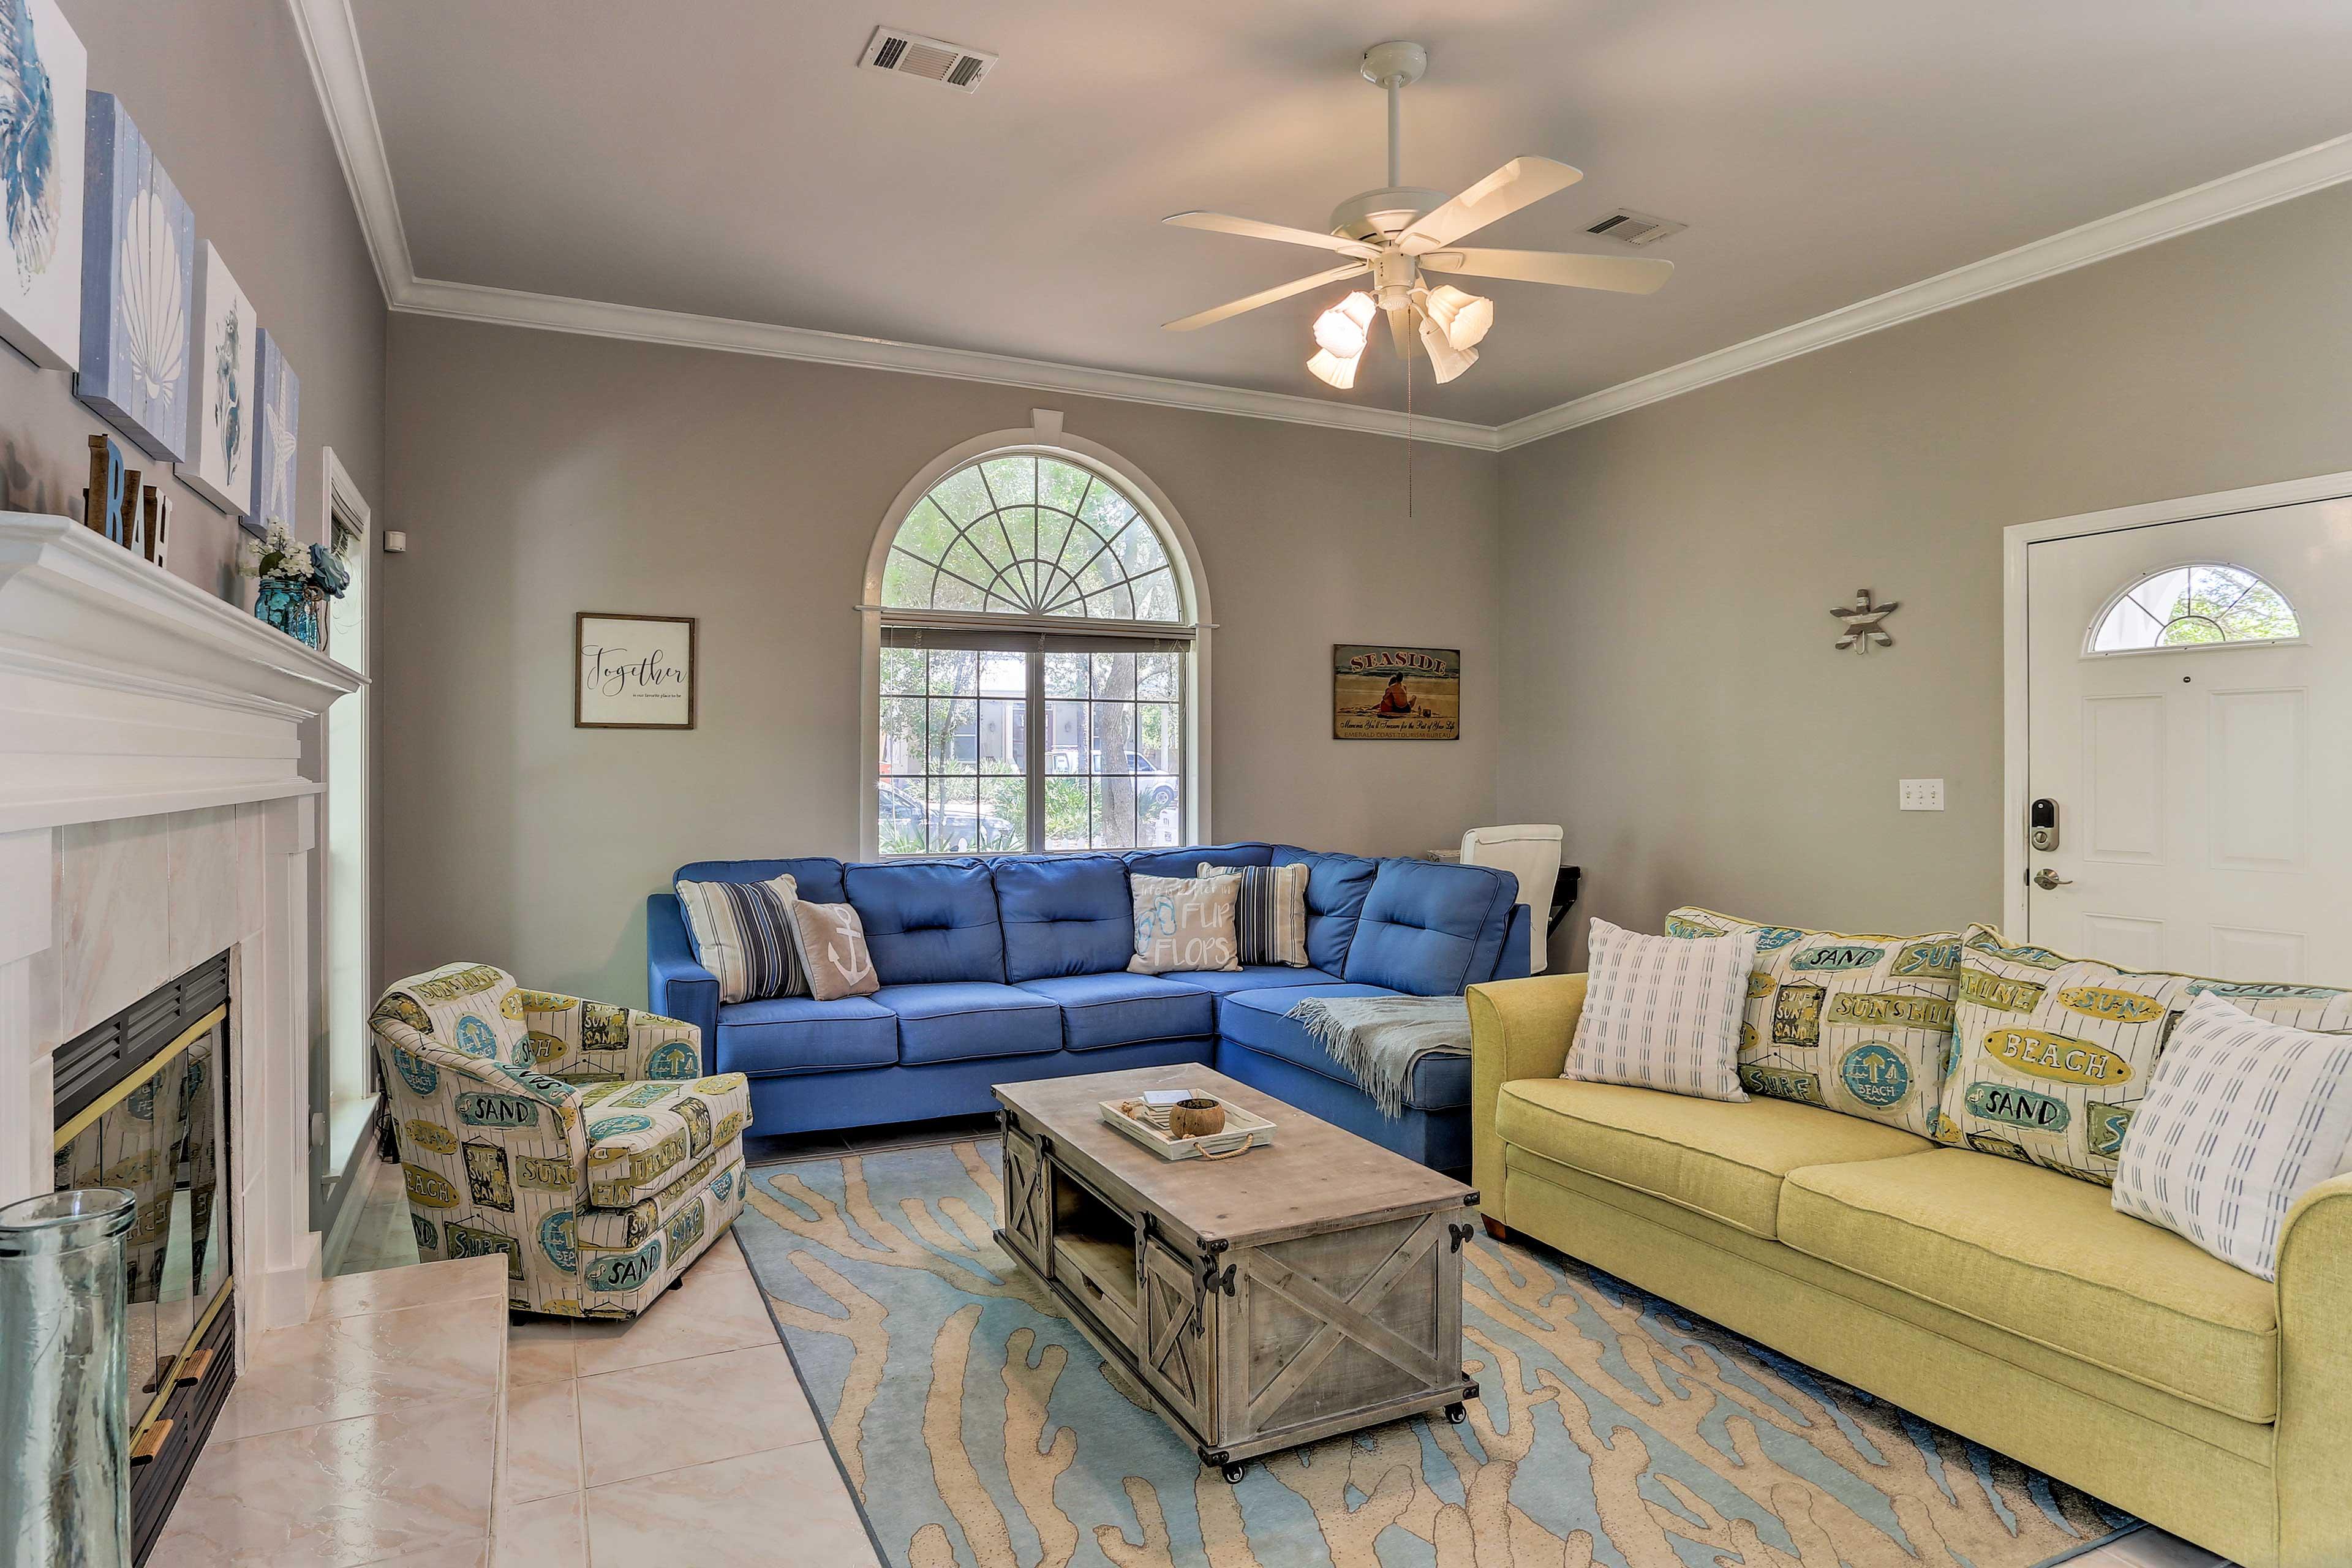 Chic beachy decor defines the home's 2,100-square-foot interior.